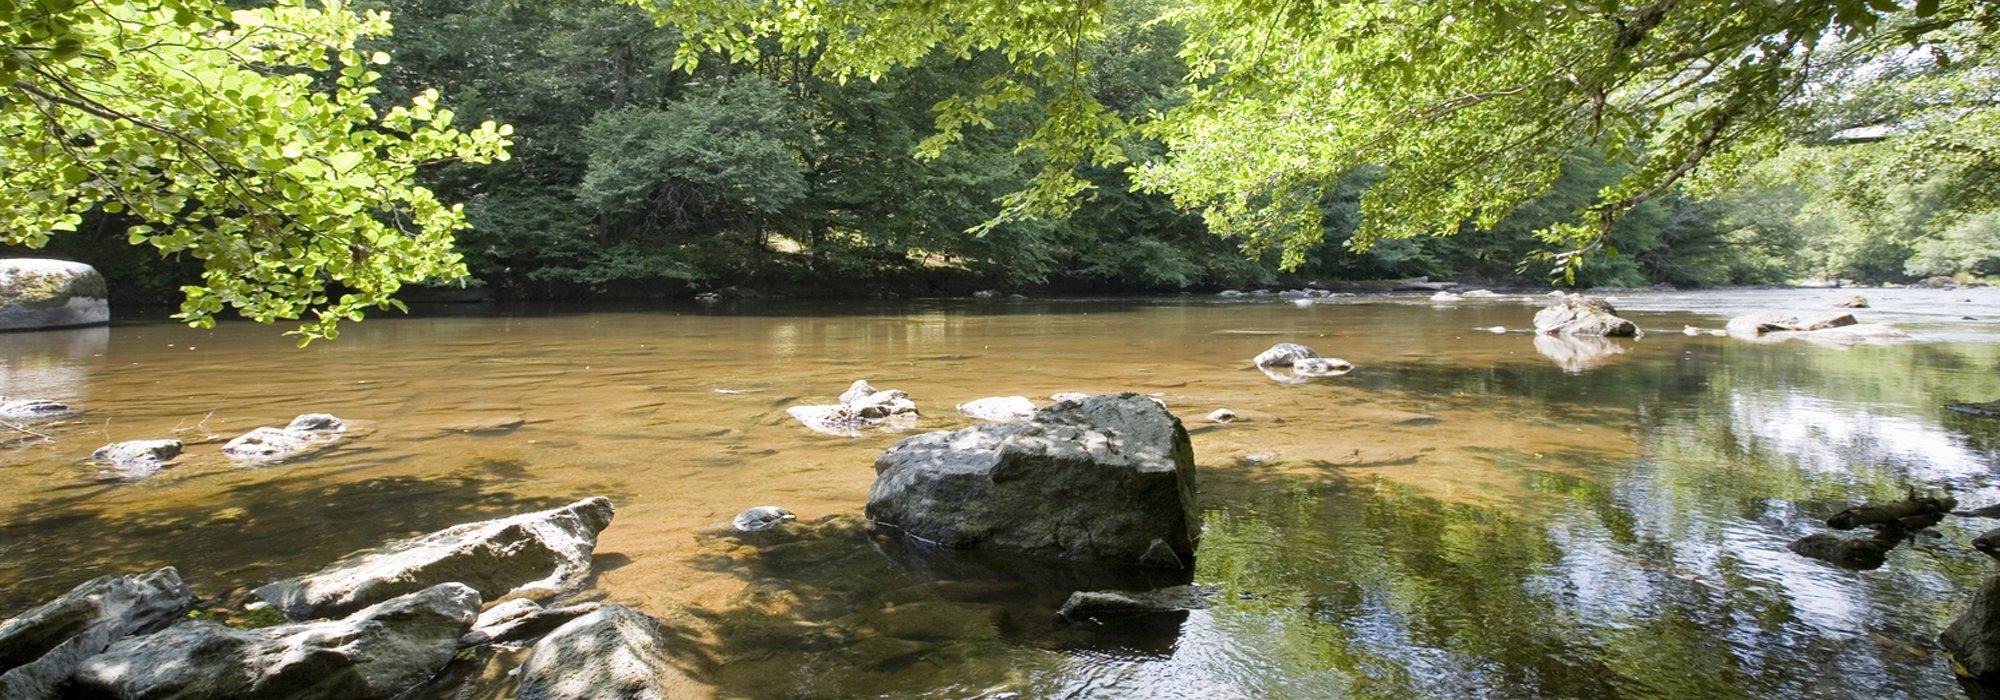 Camping la roche posay piscines futuroscope vienne for Camping puy du fou avec piscine couverte